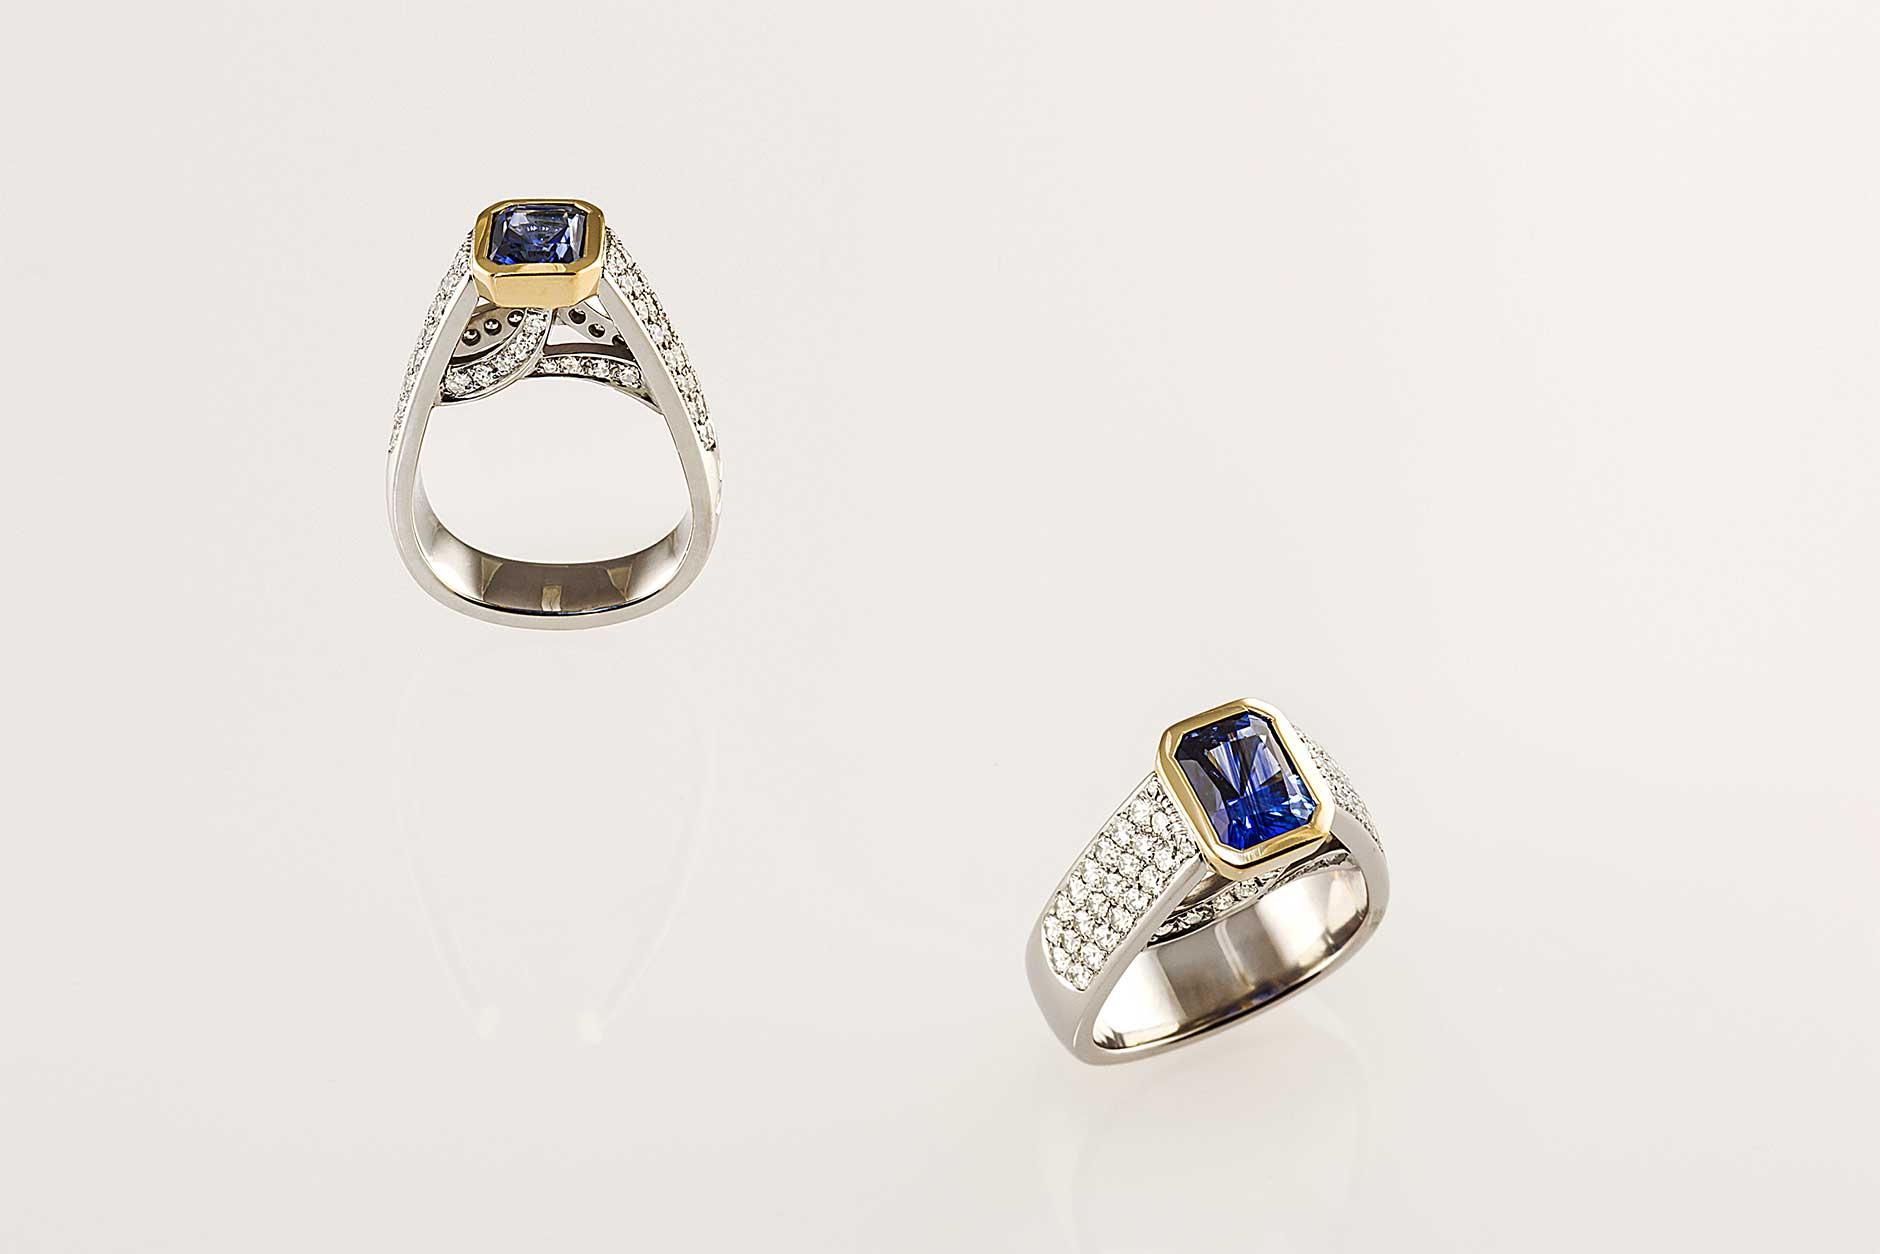 Custom Platinum Blue Sapphire Engagement Ring with Pave Set Diamonds - NÉWA Goldsmith